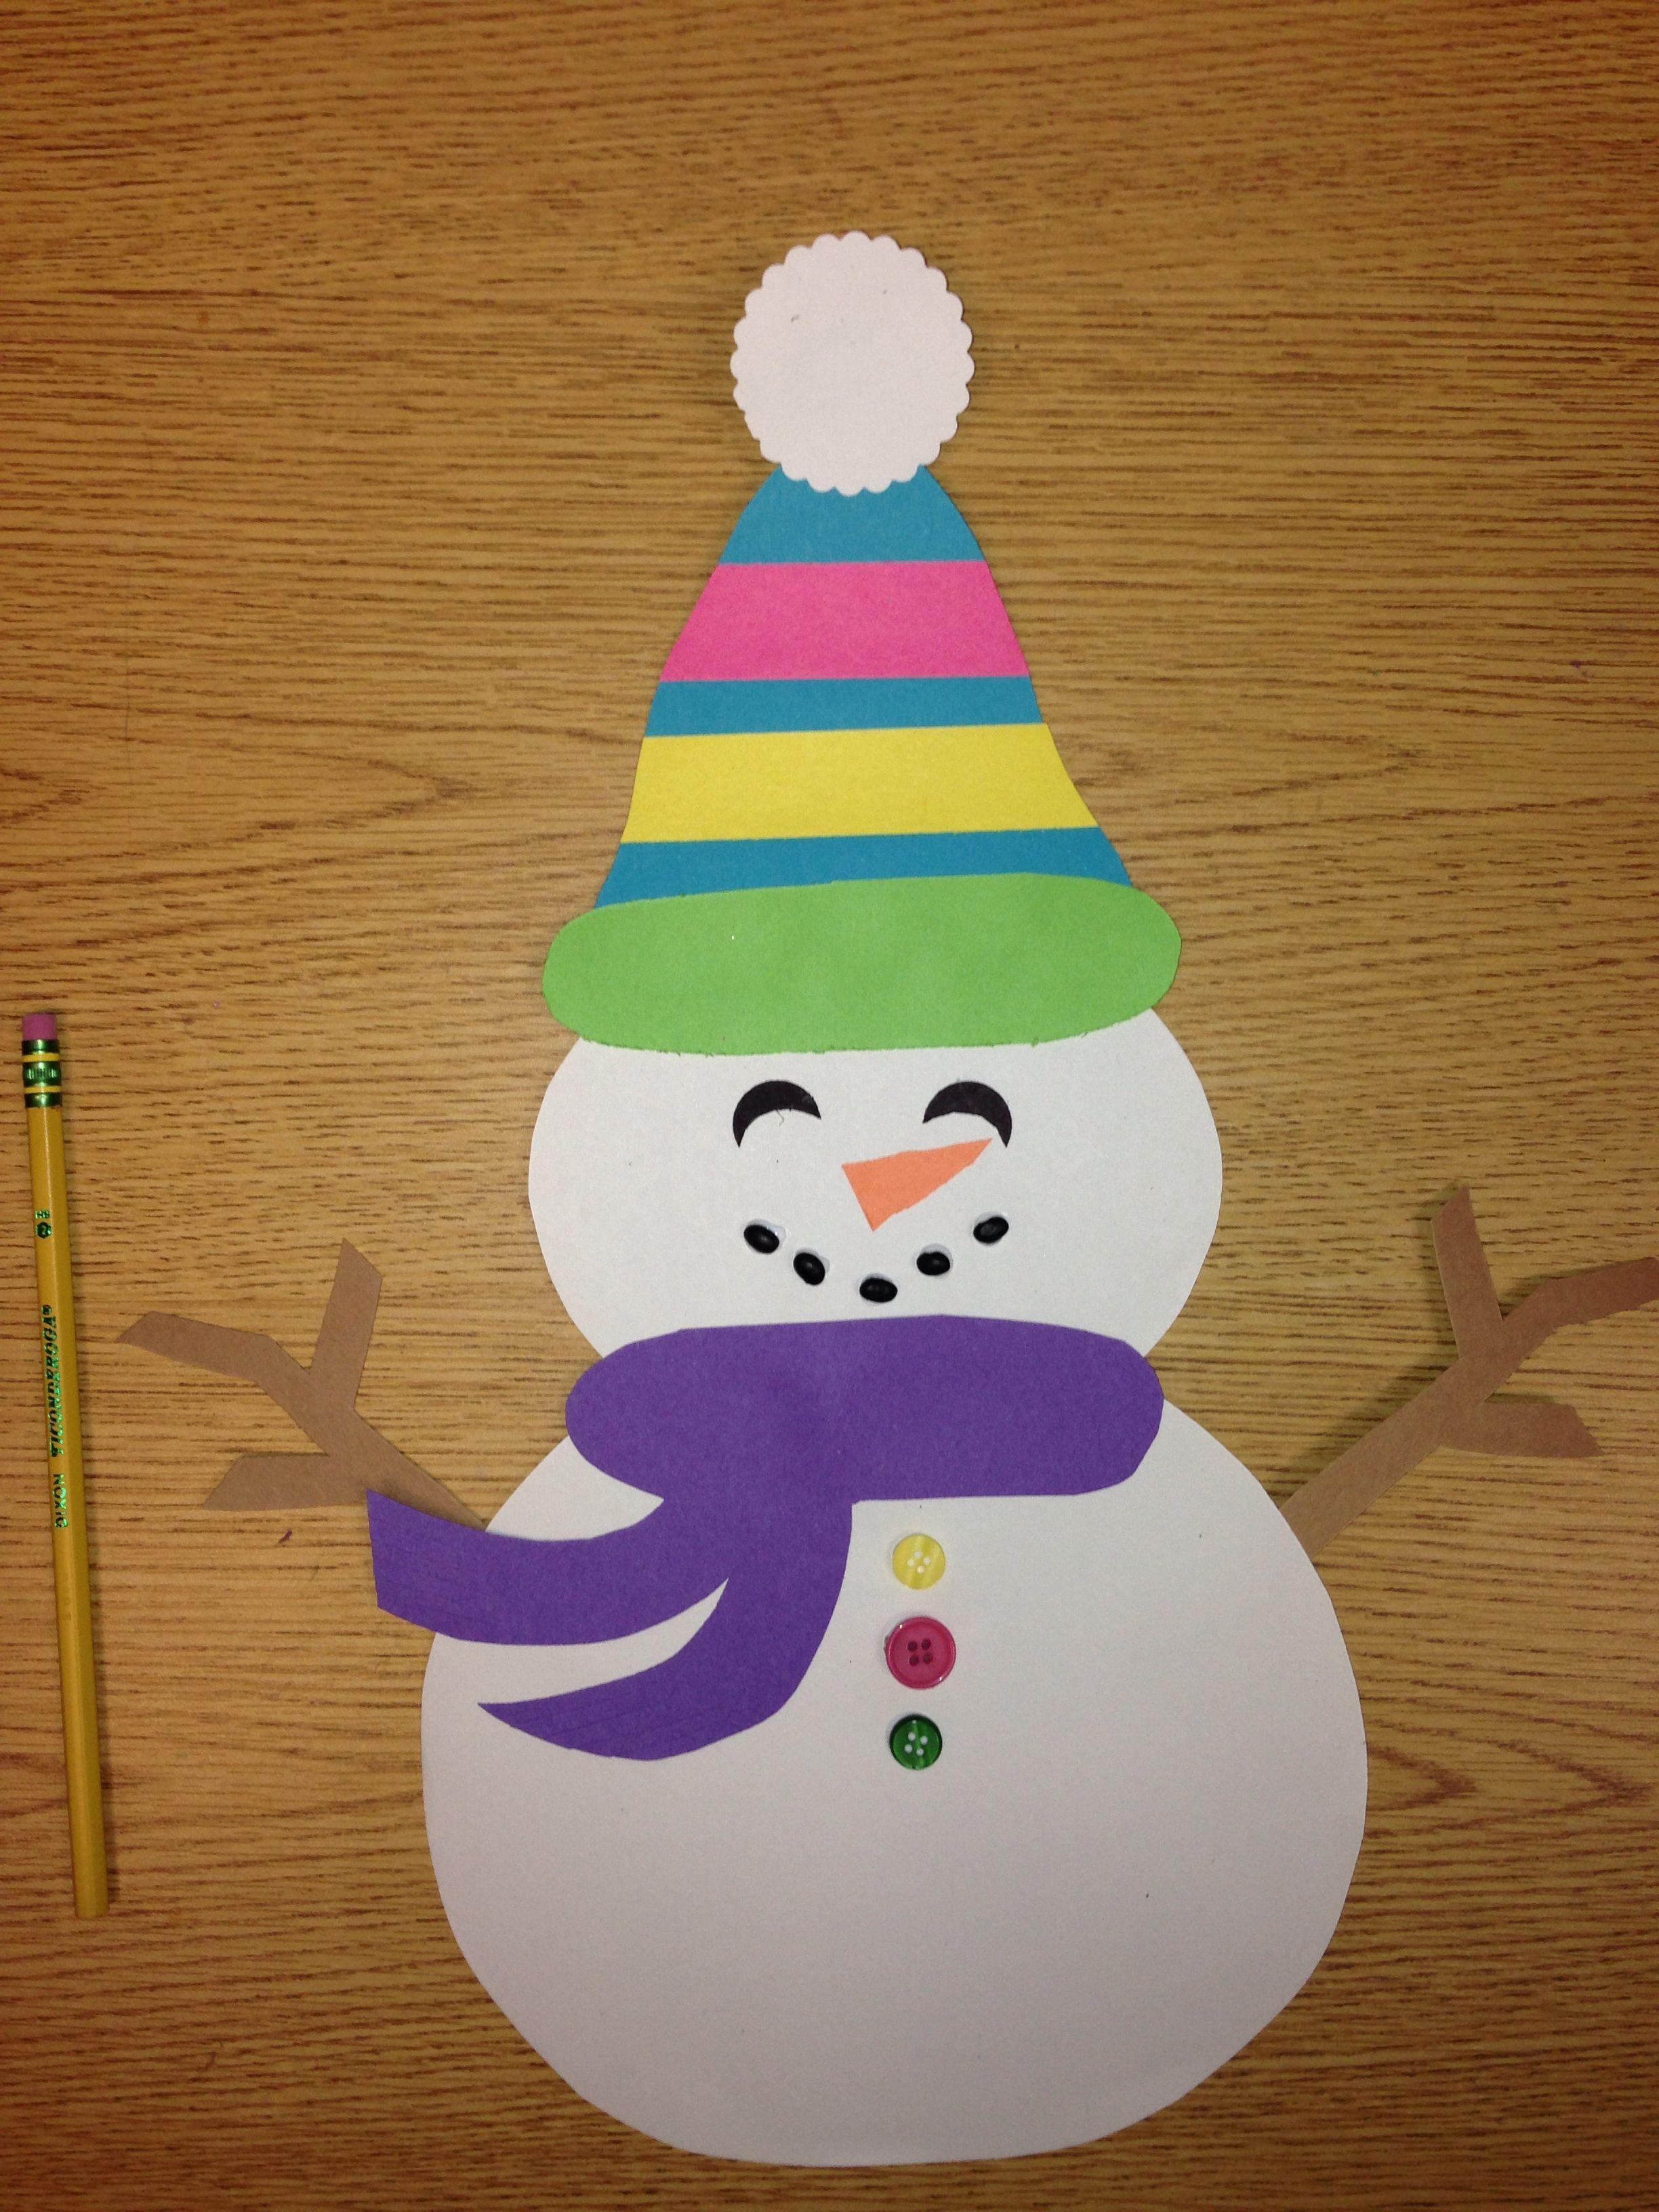 Snowman Craft Easy Kindergarten Or 1st Grade I Used